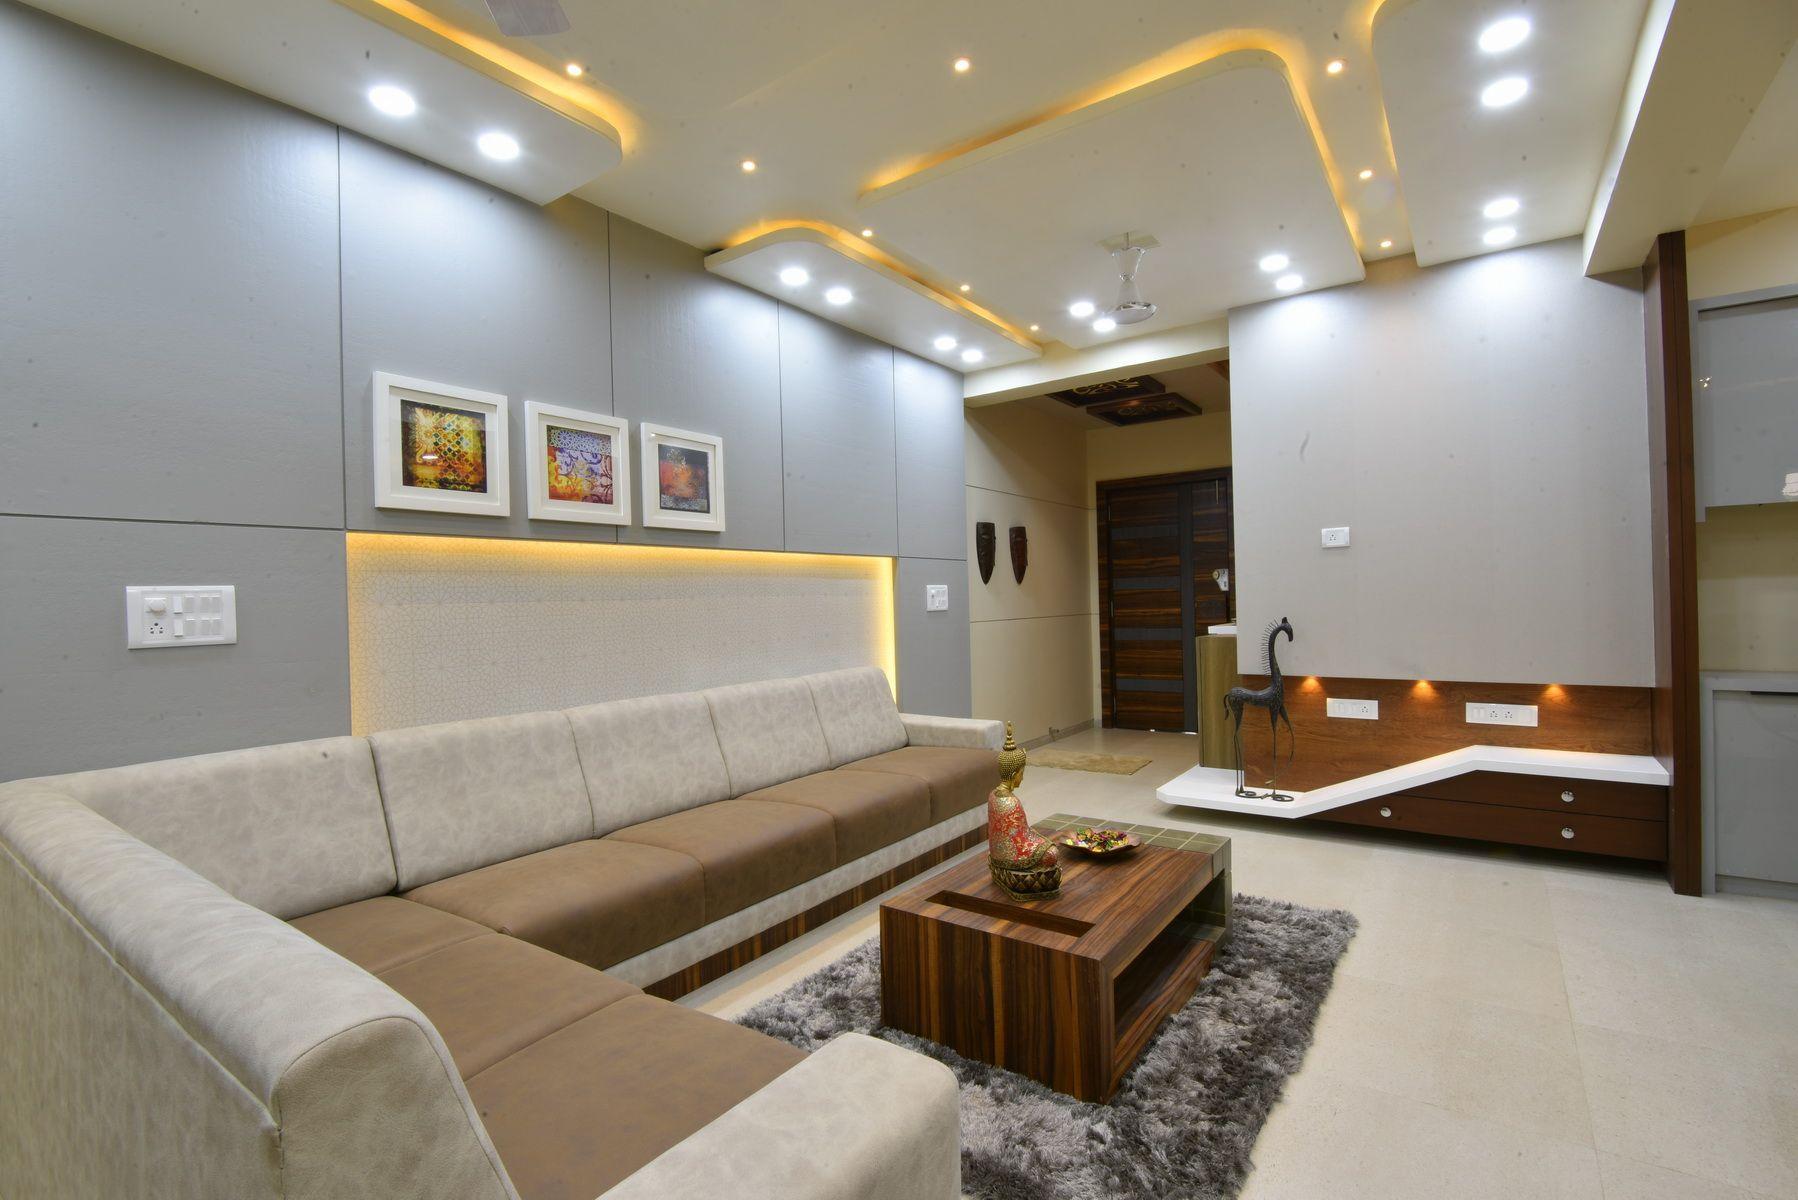 Pin by Deeksha Jain on INTERIOR | False ceiling bedroom ...